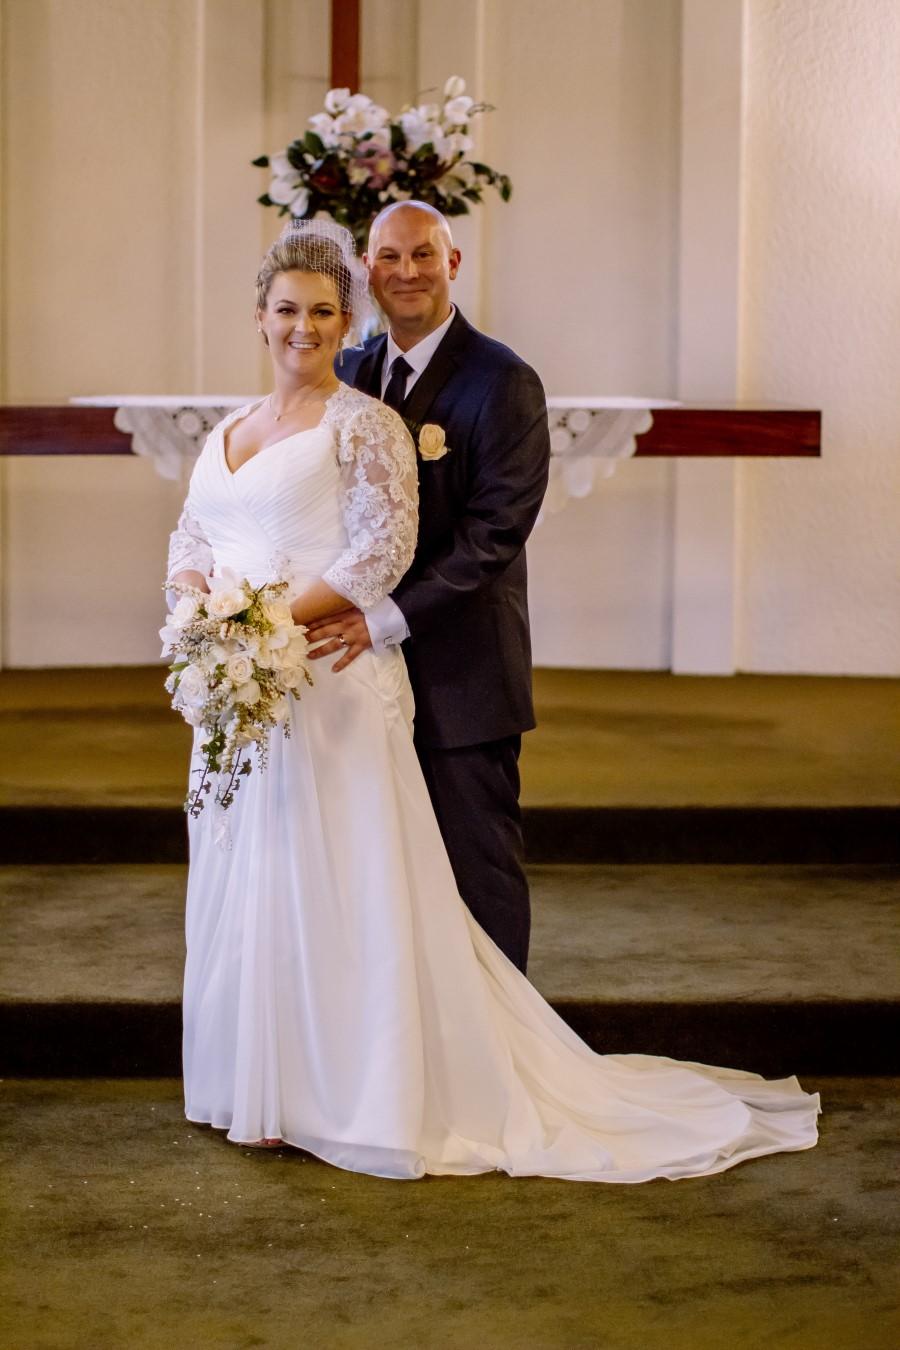 nz_wedding_st_leonards_mchughs-484